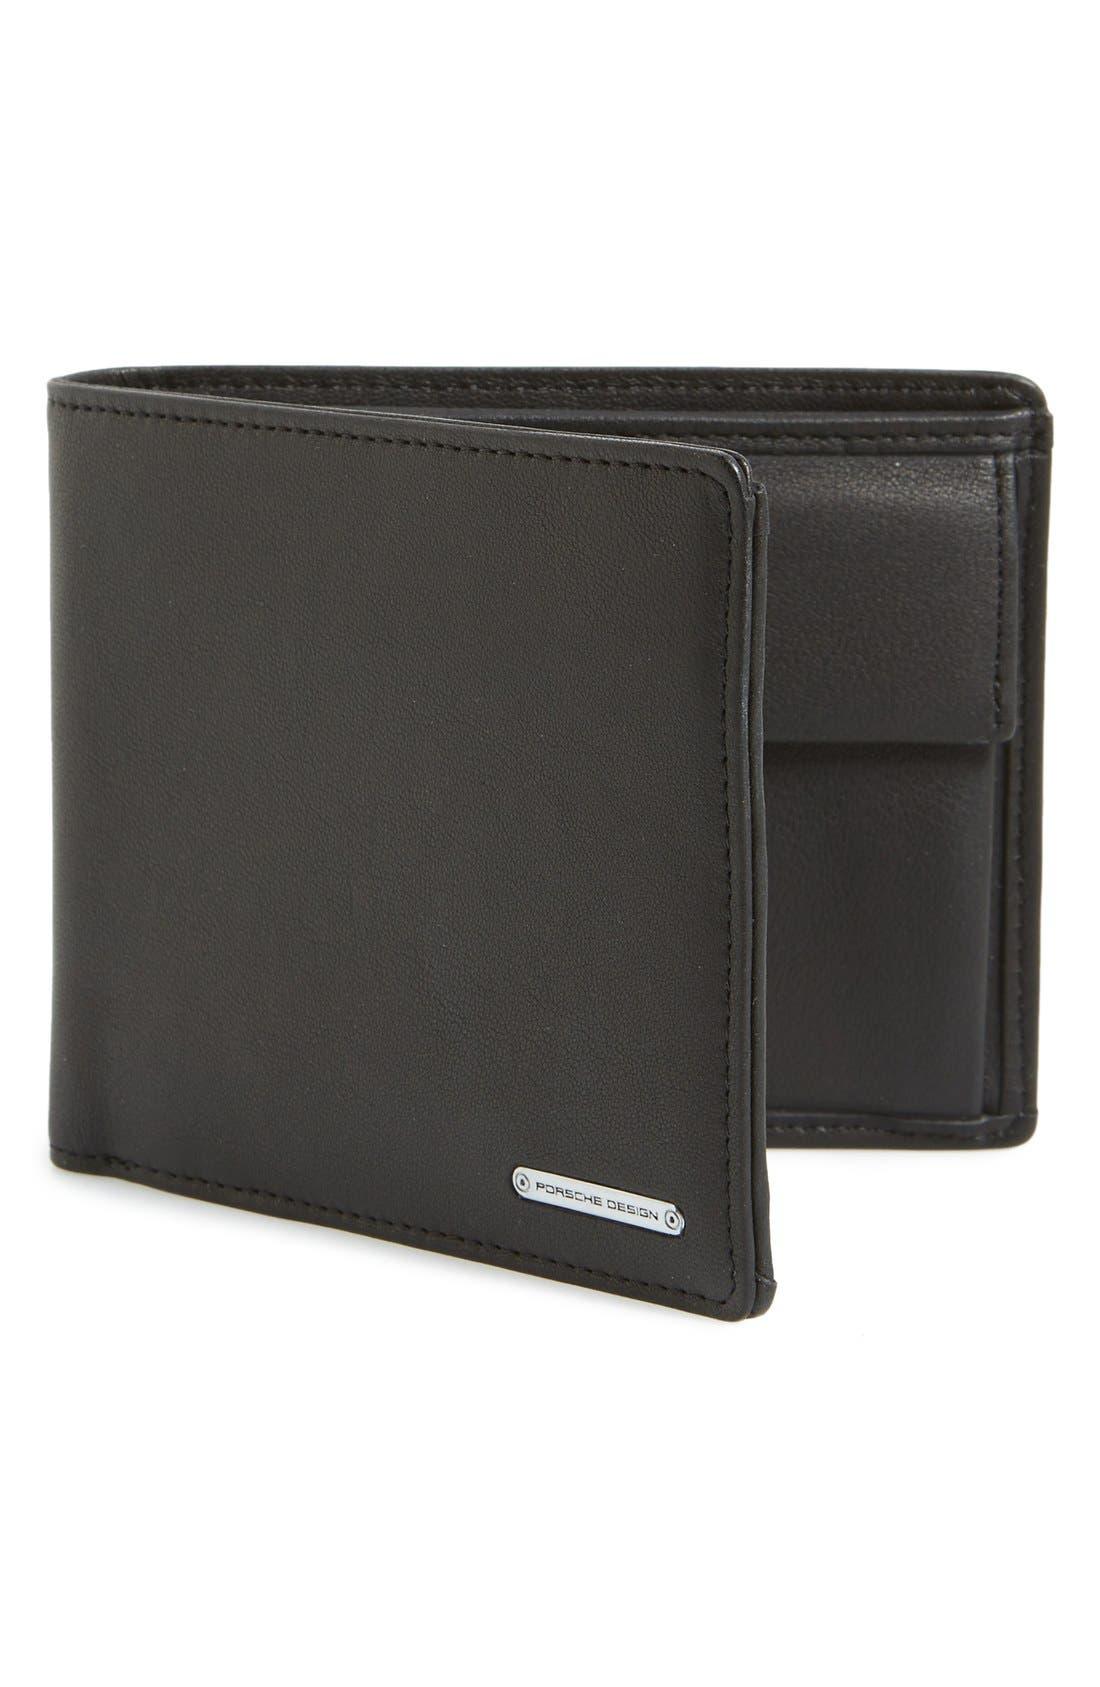 'CL2 2.0' Leather Billfold Wallet,                         Main,                         color, Black